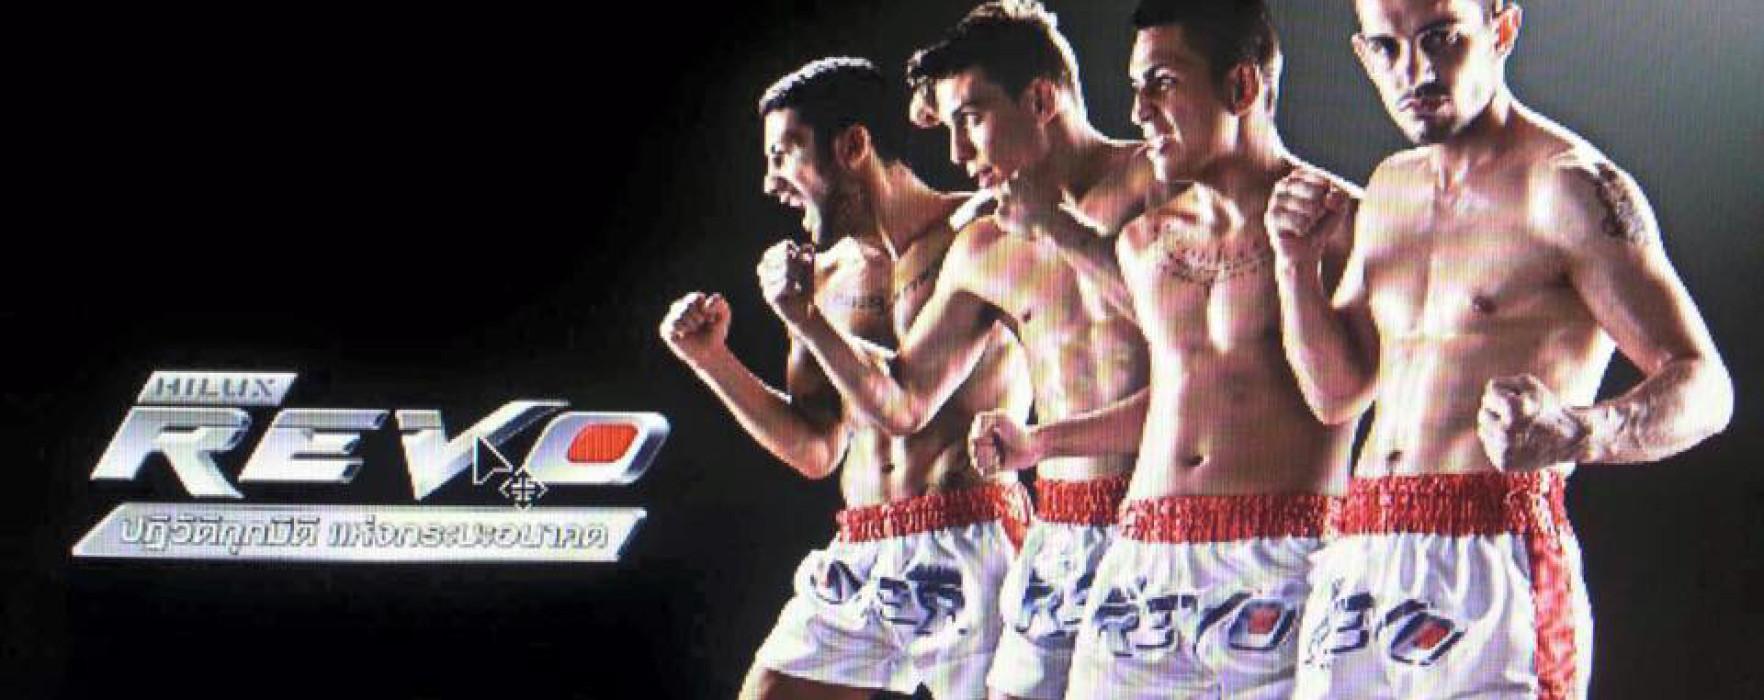 Card: Toyota Marathon featuring Sam-A, Superball, Aranchai, Mathias, Carlos & Melo Muay Farang